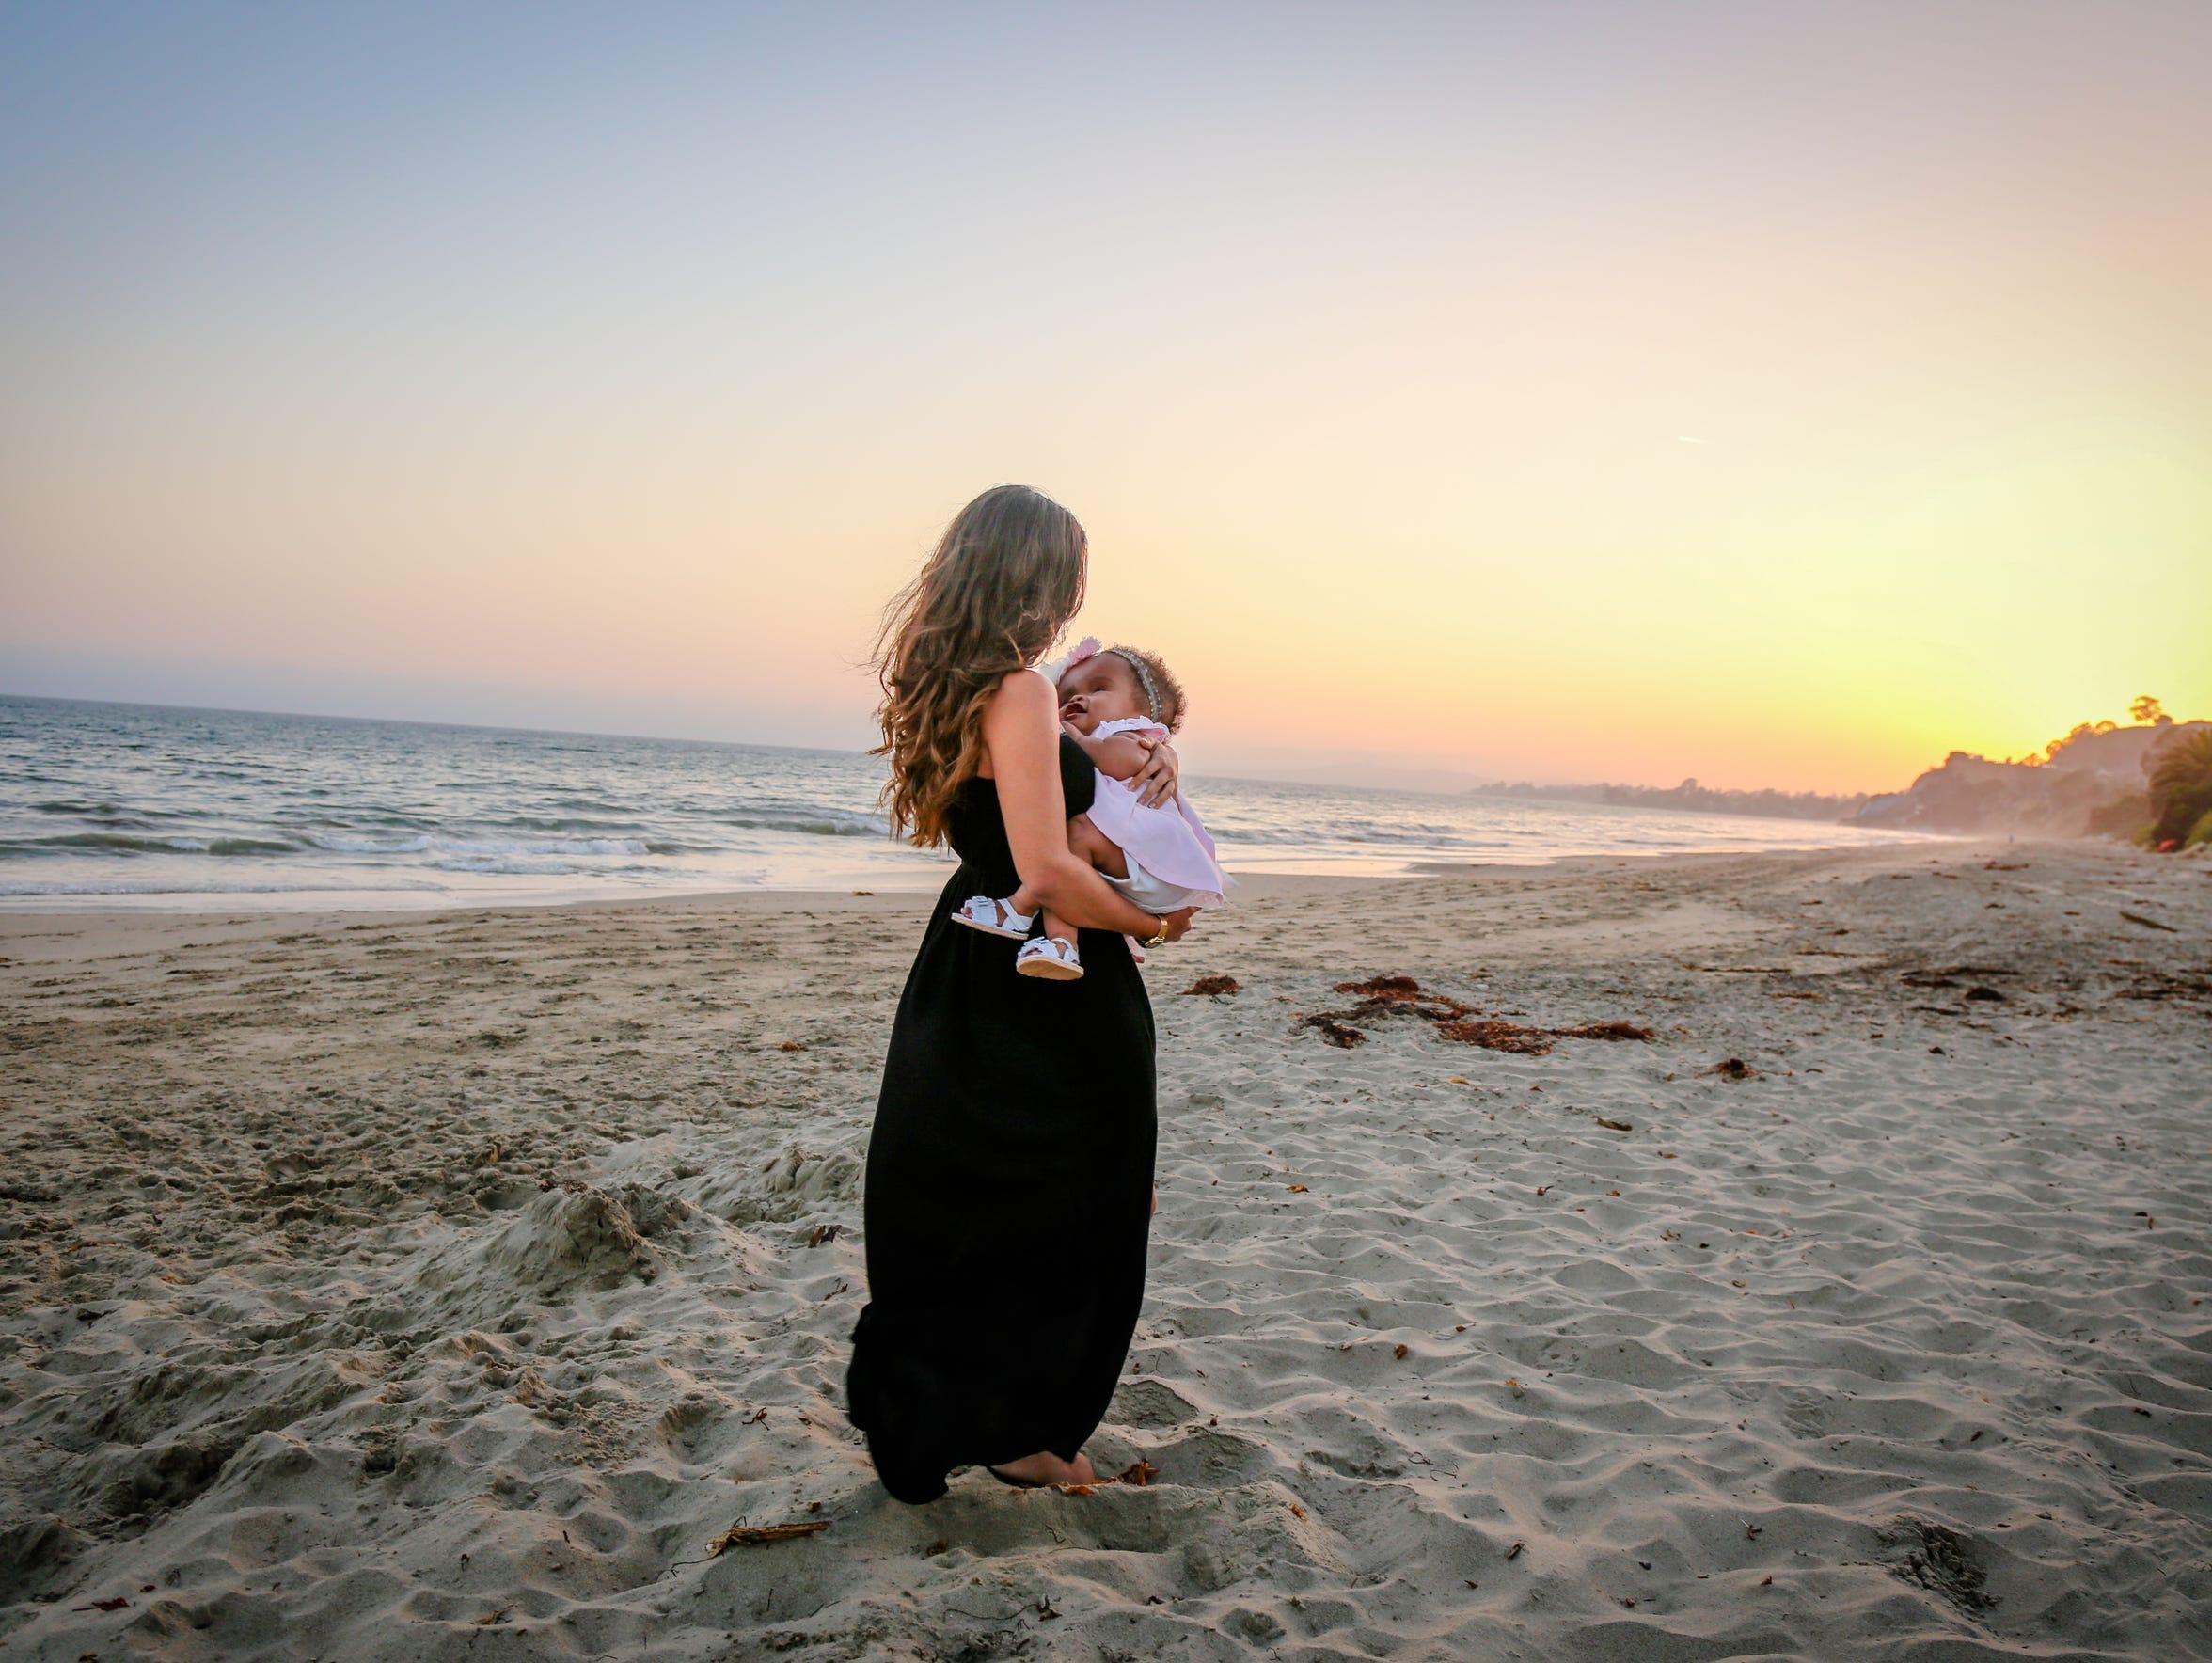 Sarah Conque has dedicated her life to saving baby